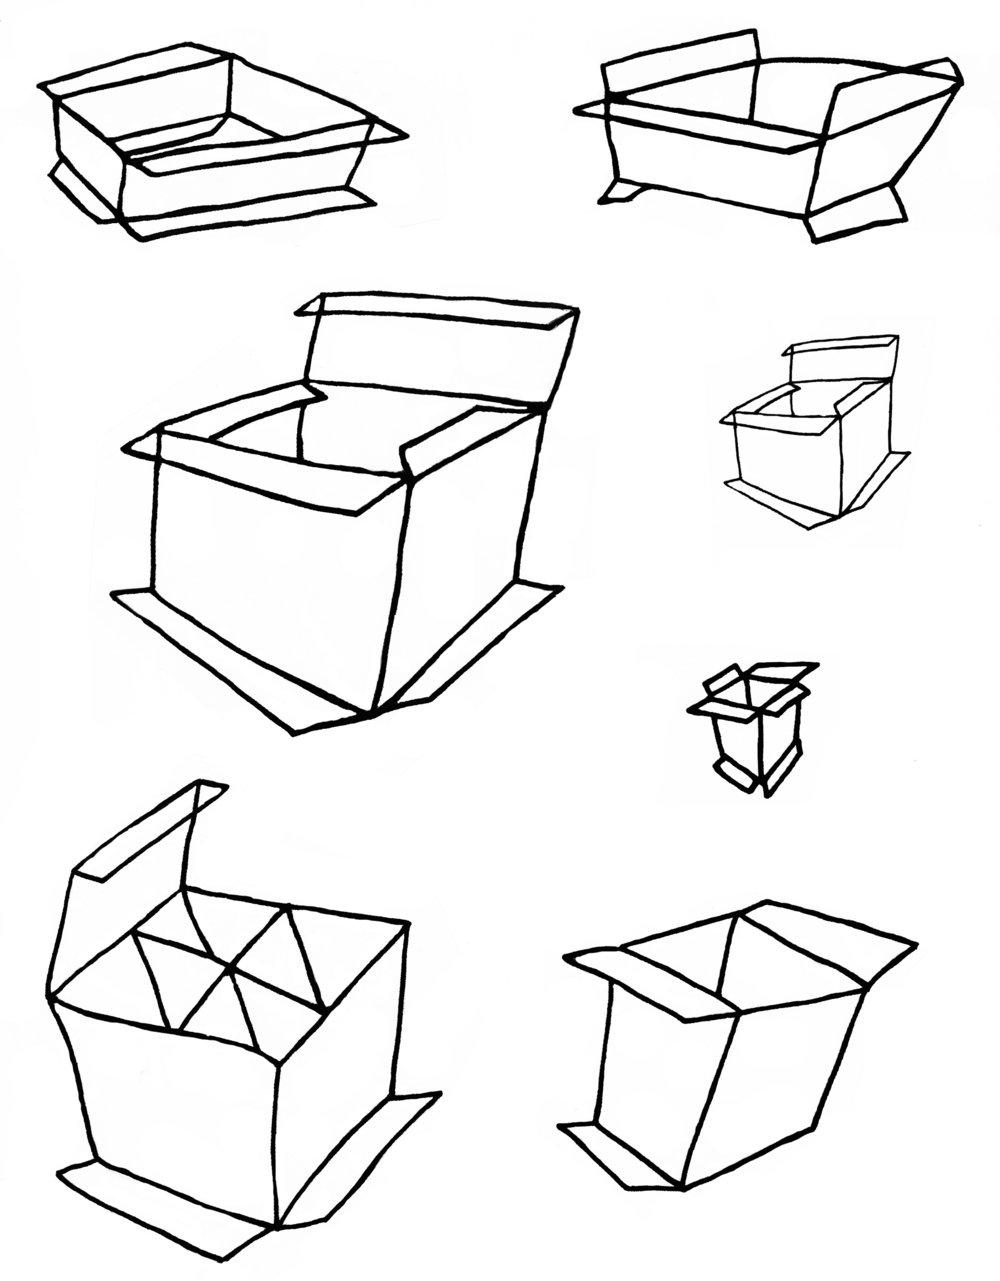 51_boxes.jpg